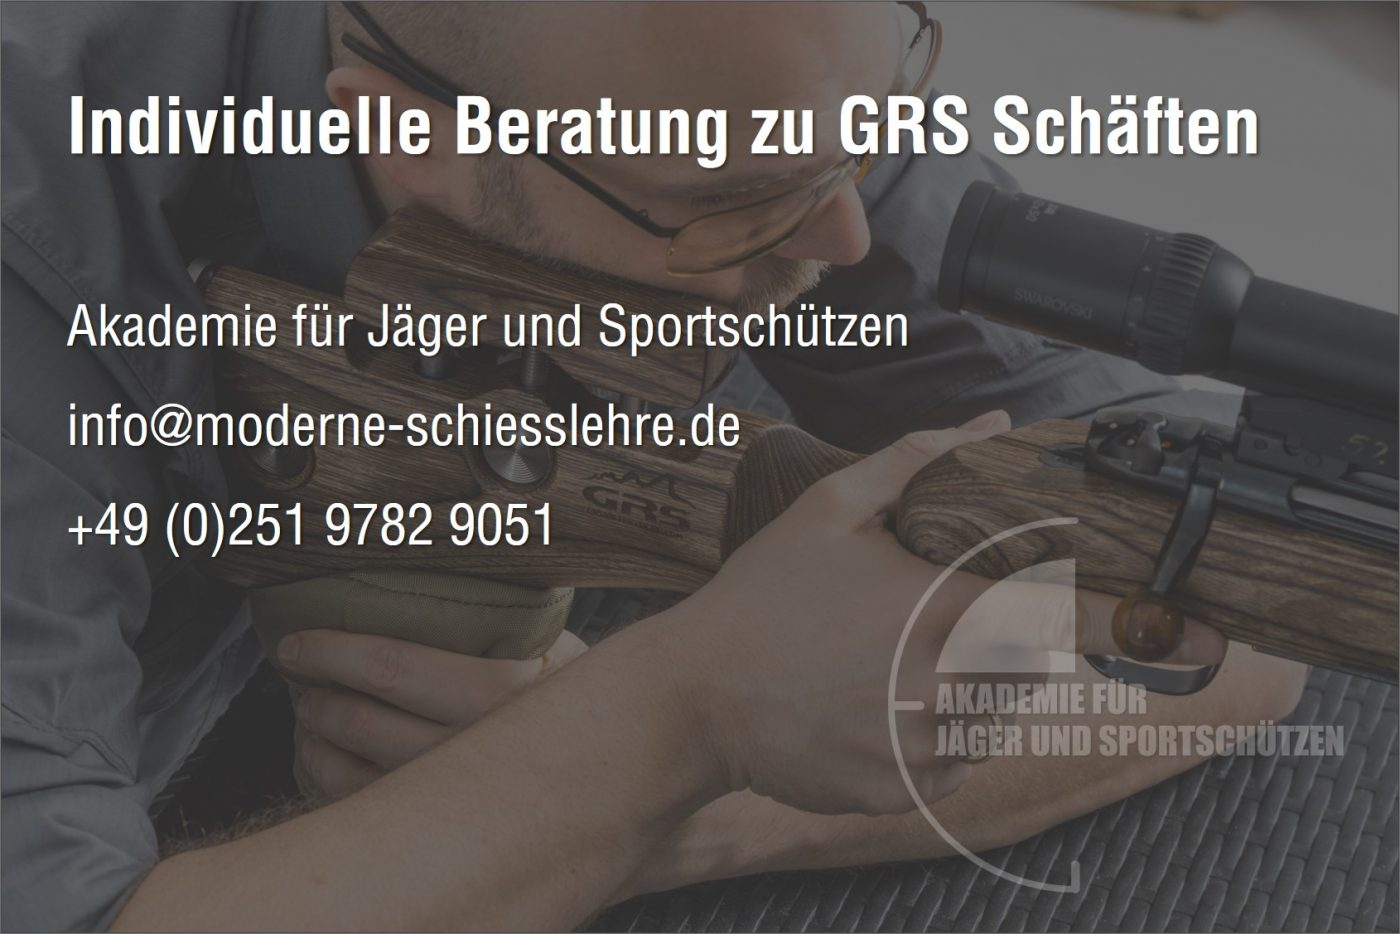 AFJS-Beratung-GRS-Schaefte